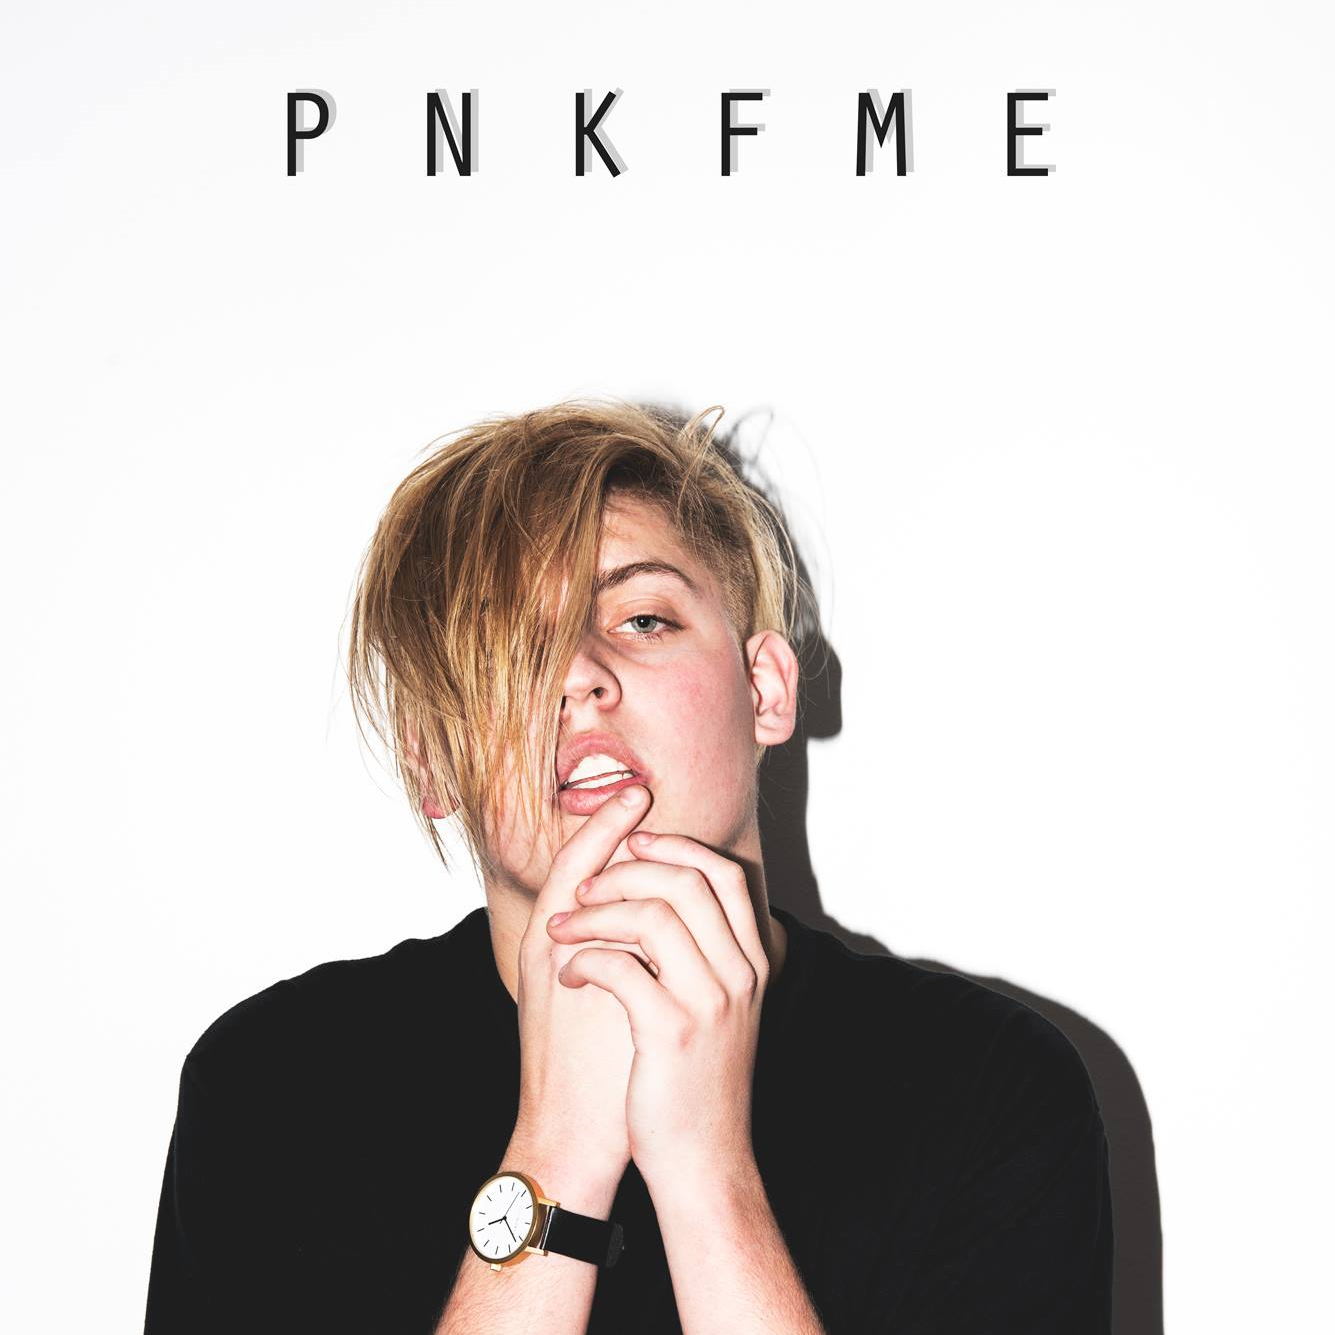 PNKFME1